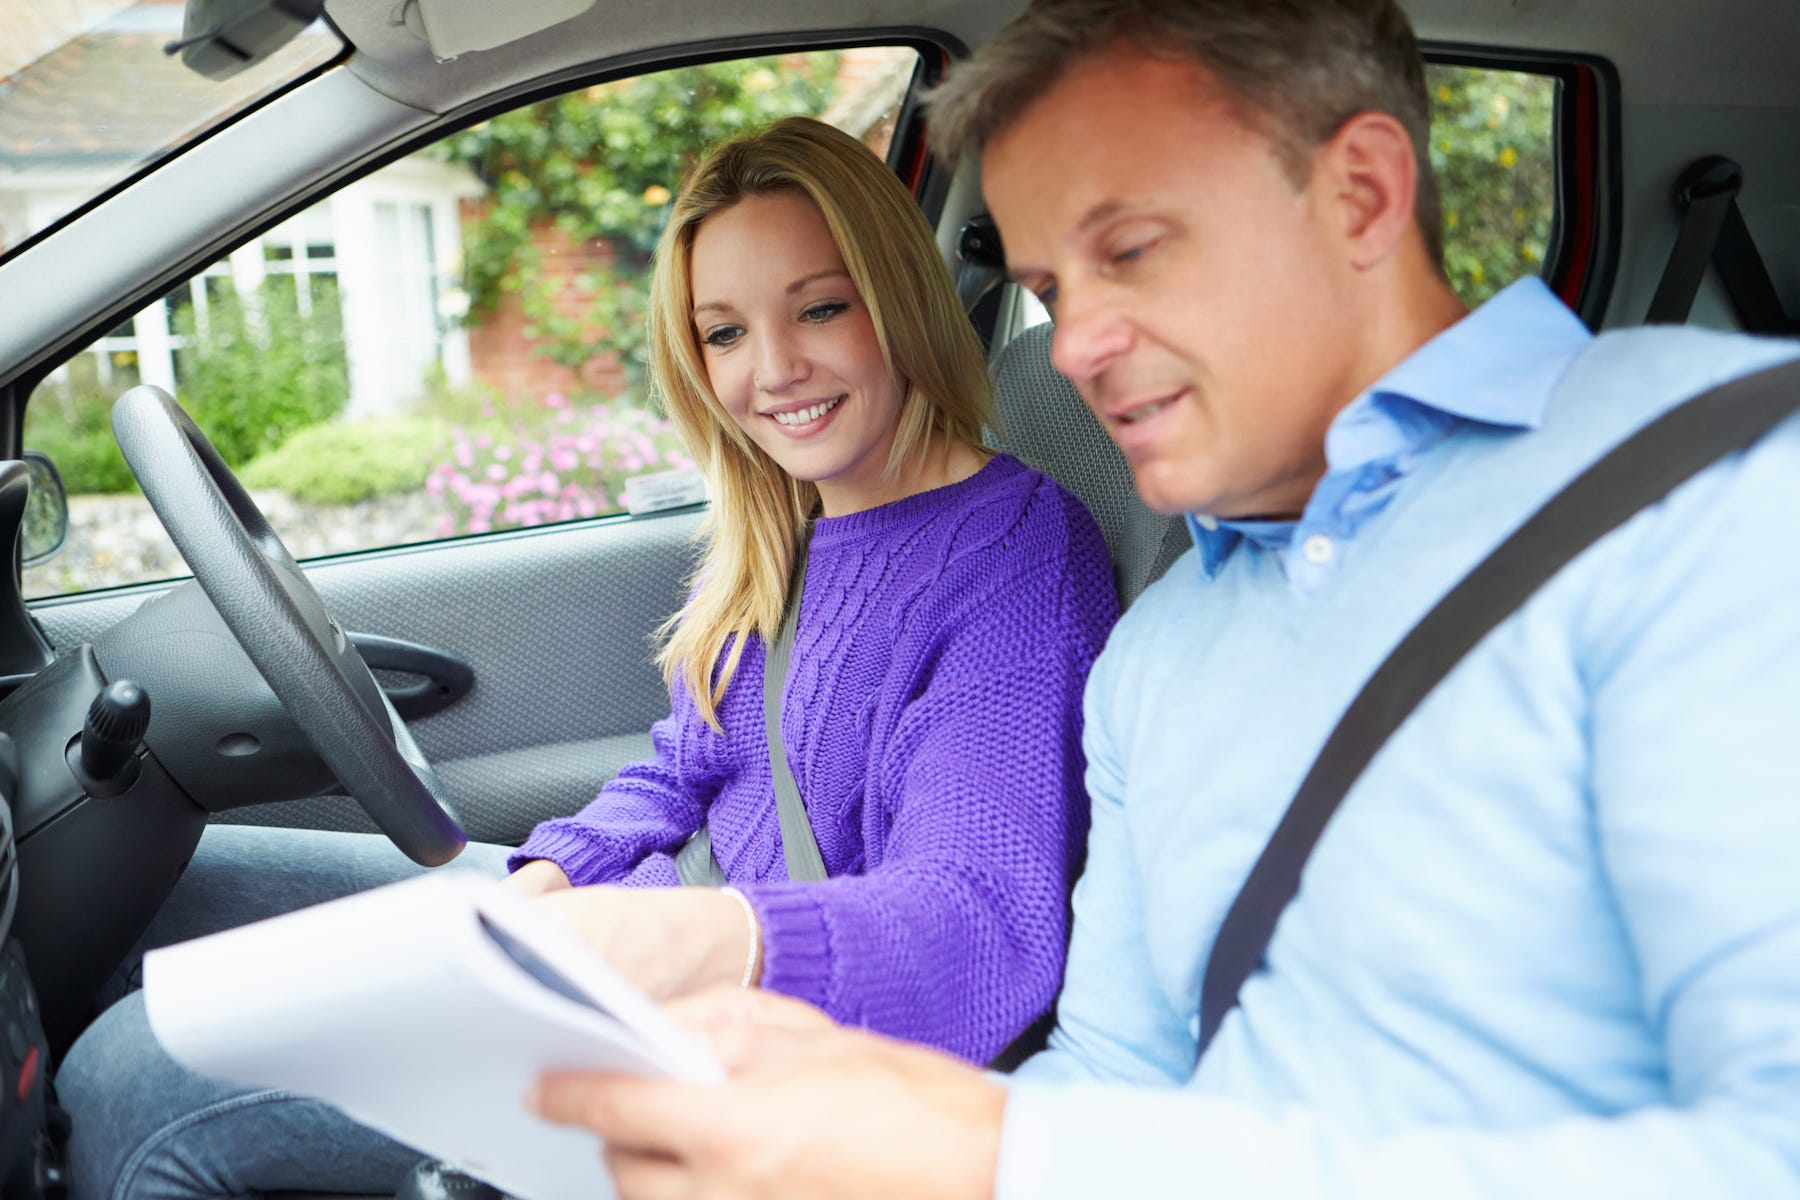 Driving instructor training in Burton